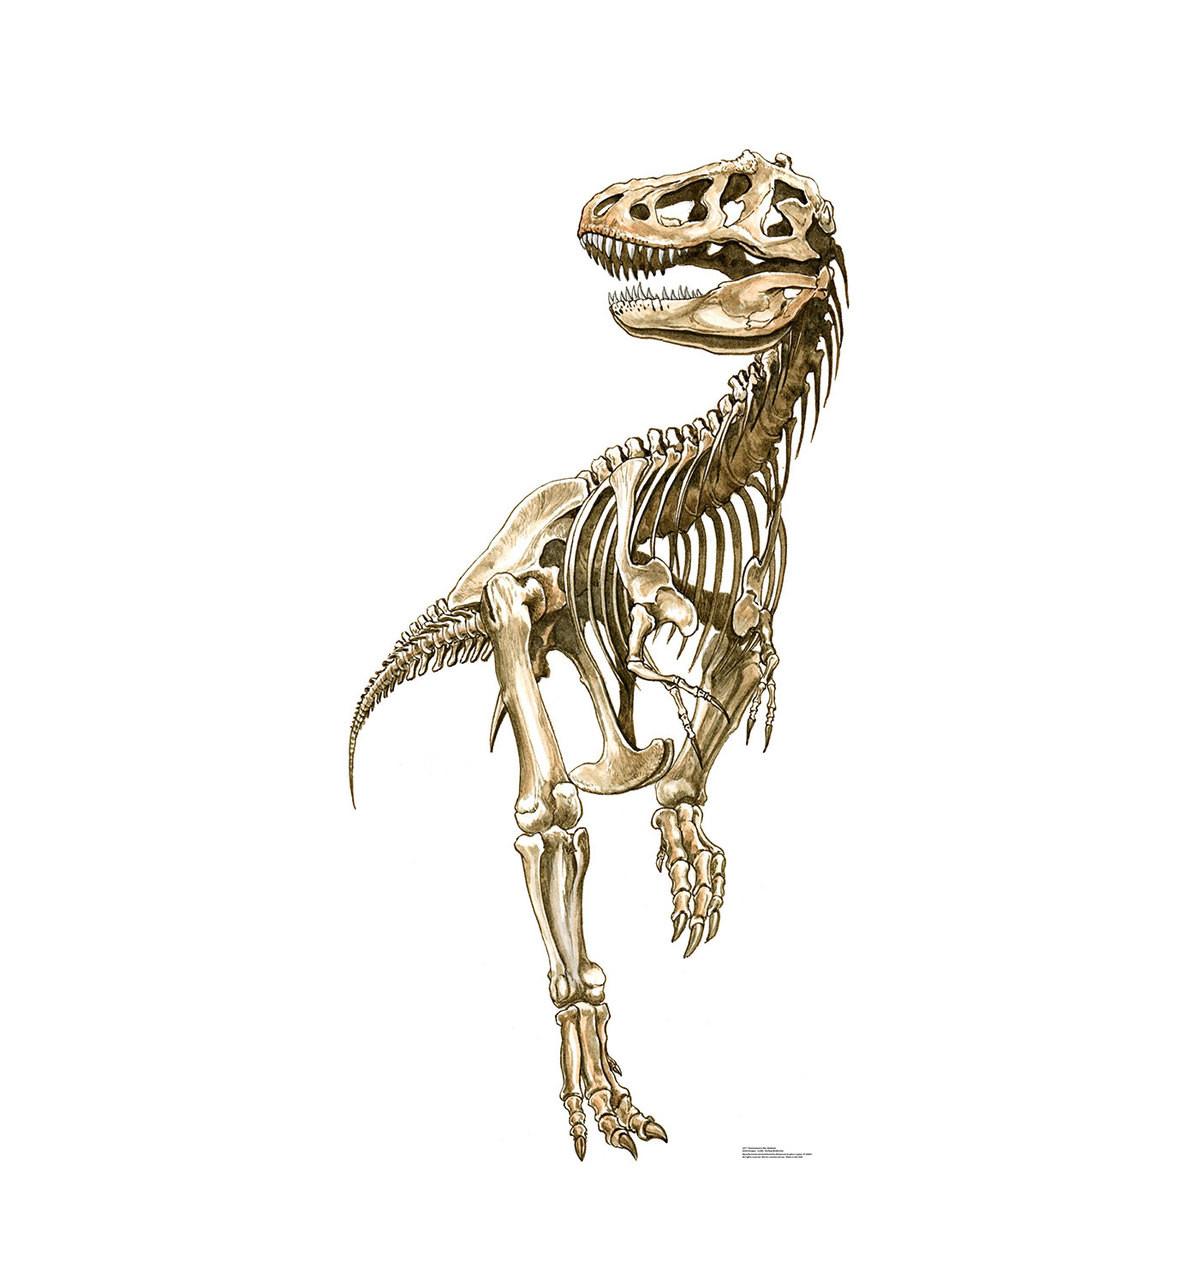 Tyrannosaurus Rex Skeleton - Cardboard Cutout